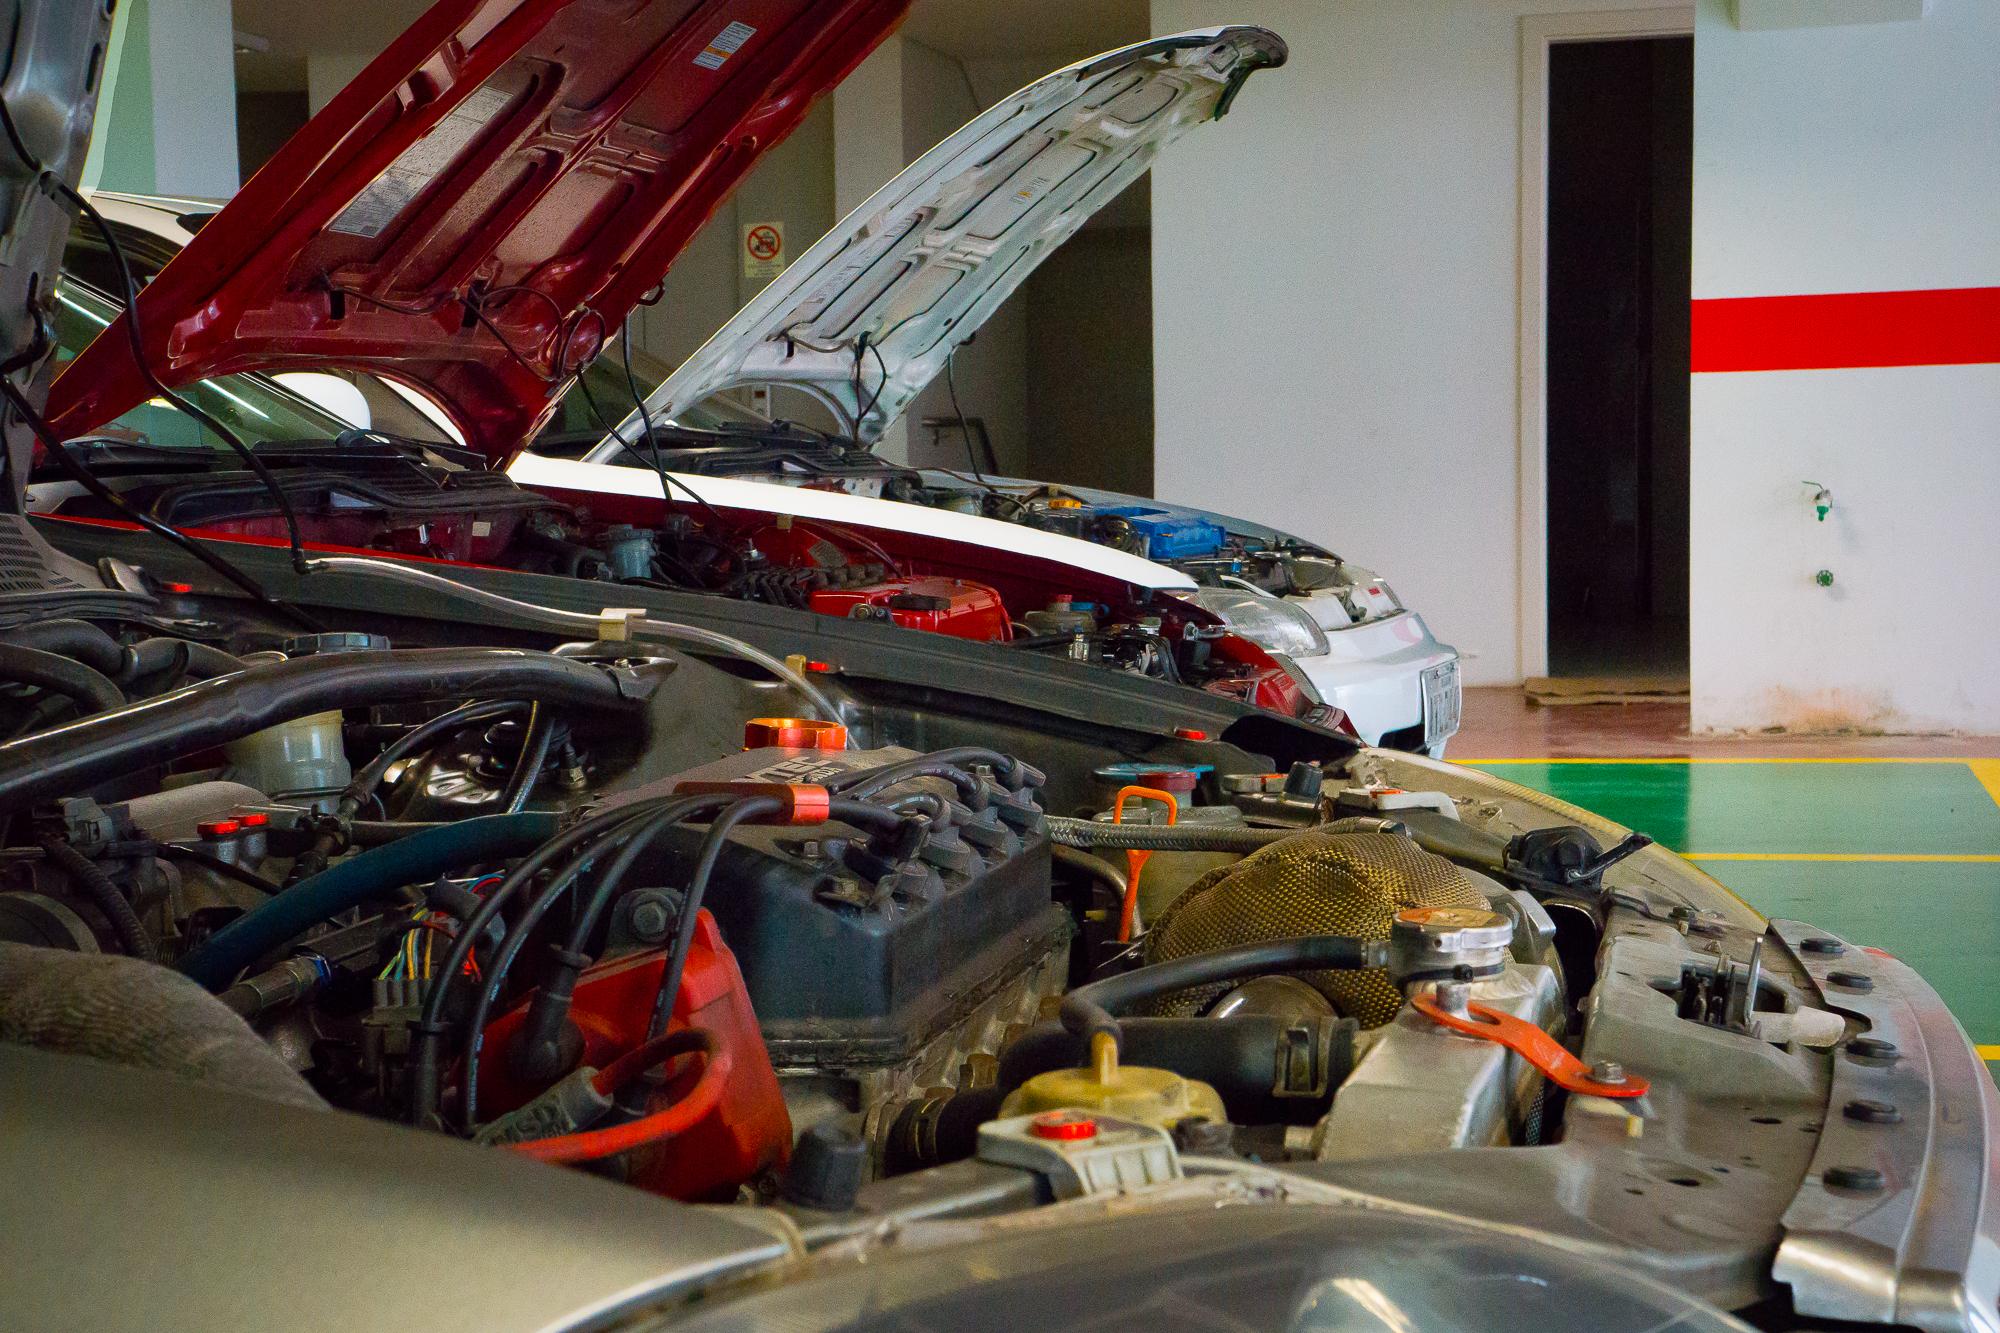 3 Honda Civics with hoods open